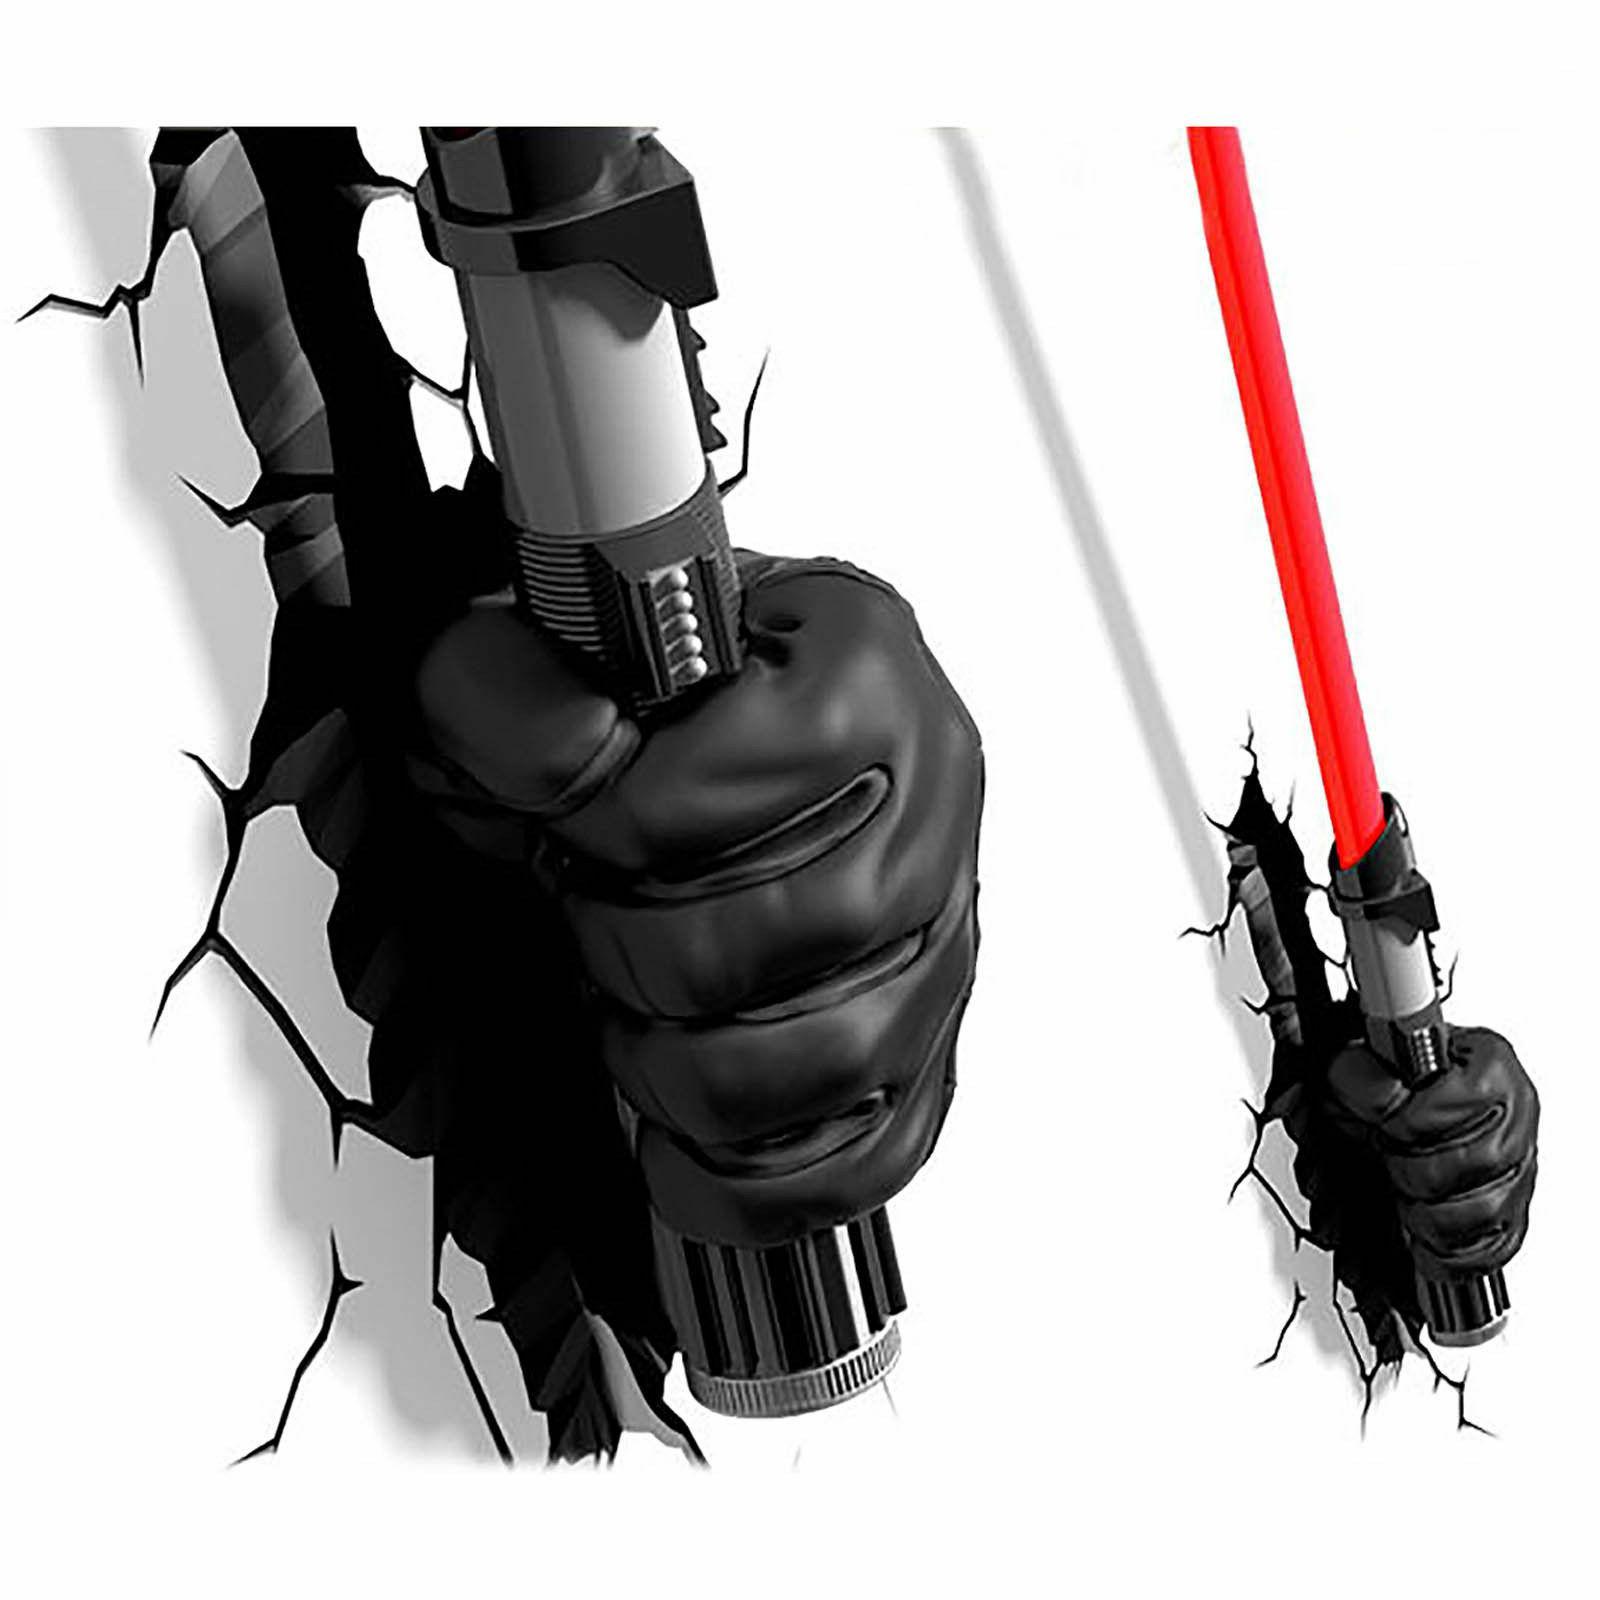 3D Star Wars Darth Vader Hand with Lightsaber FX LED Night L